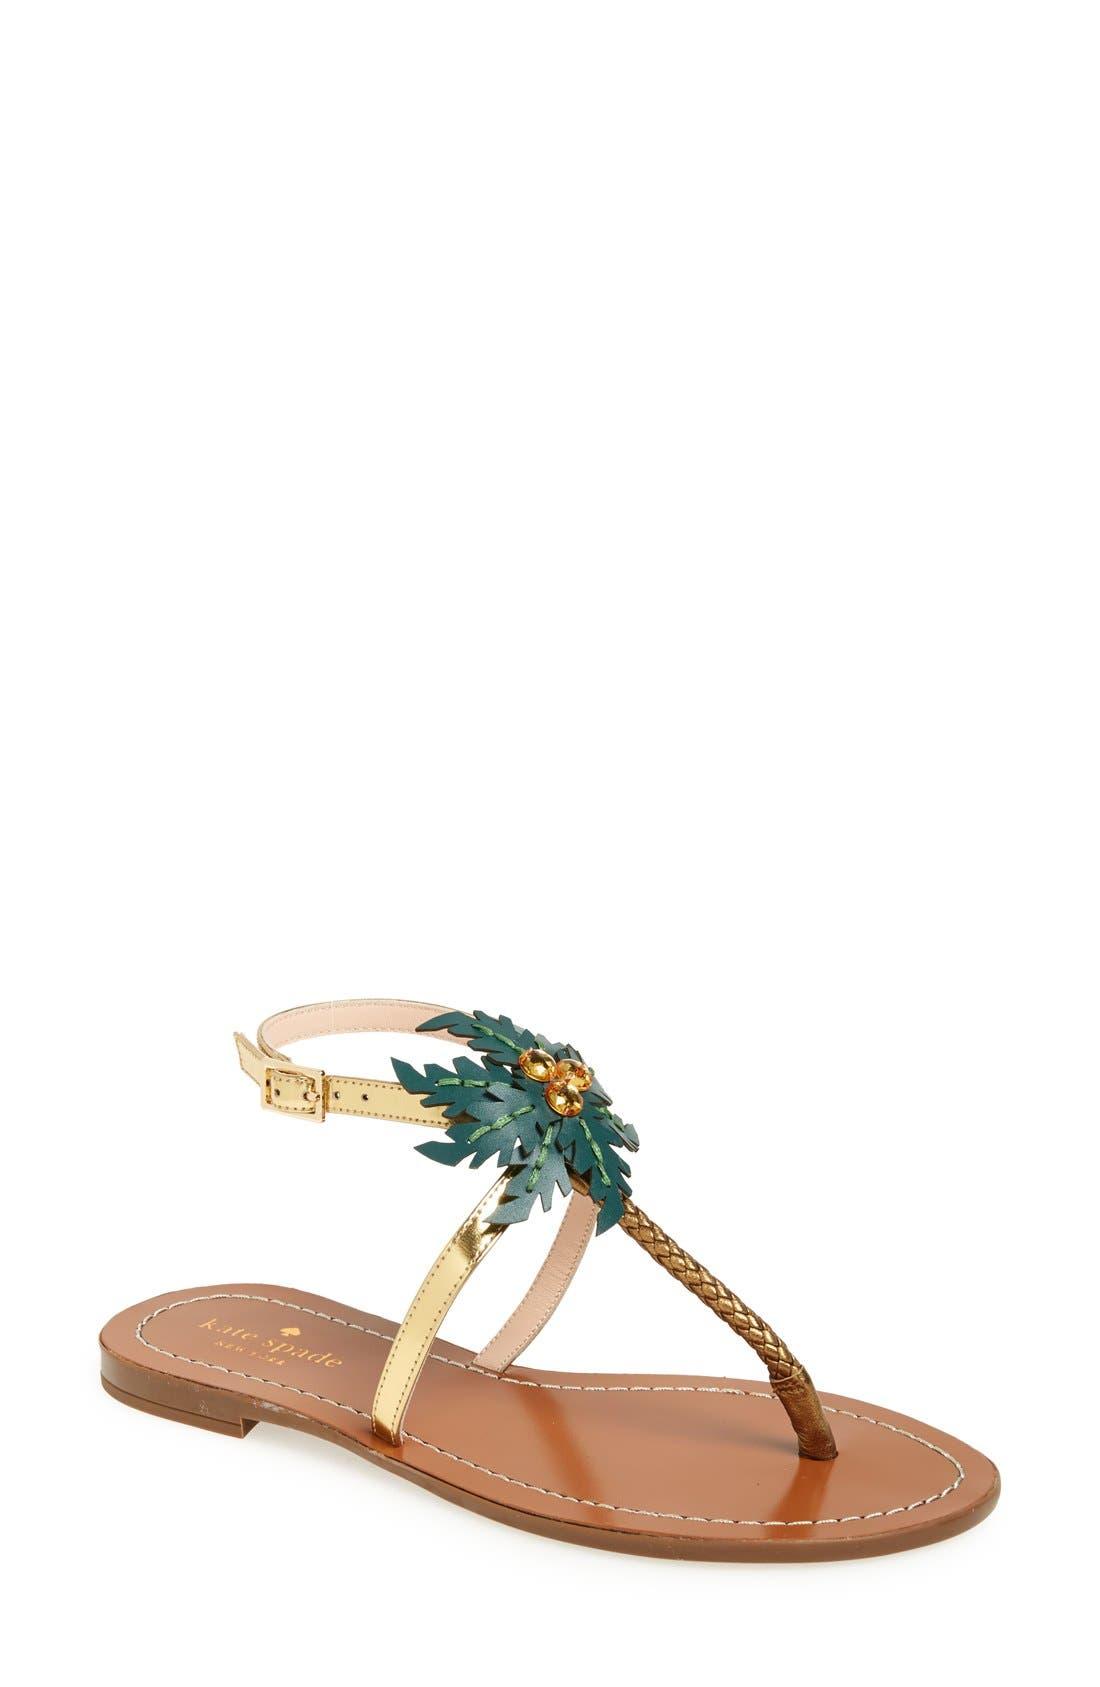 Alternate Image 1 Selected - kate spade new york 'solana' palm tree sandal (Women)